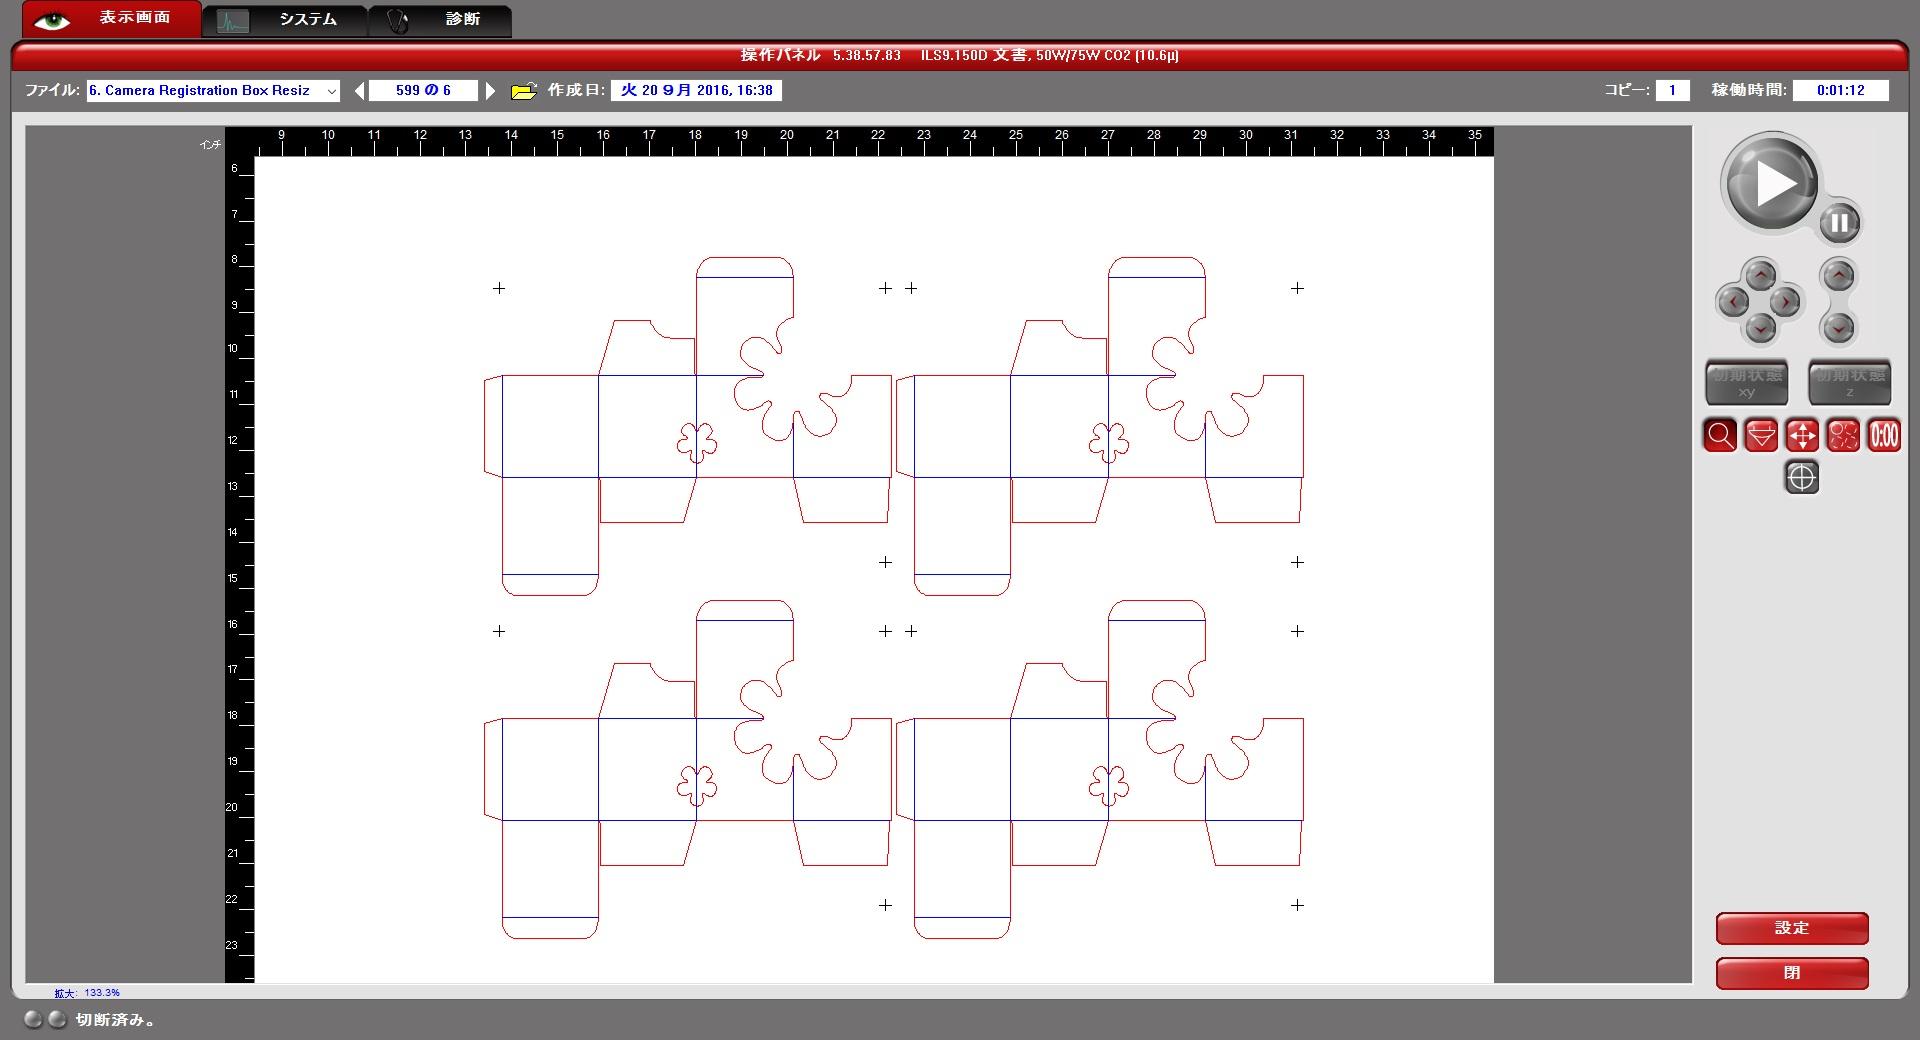 XLSシステムでの、複製製作した単一カメラの登録プロセスの4つの複製を示すレーザーシステムソフトウエア